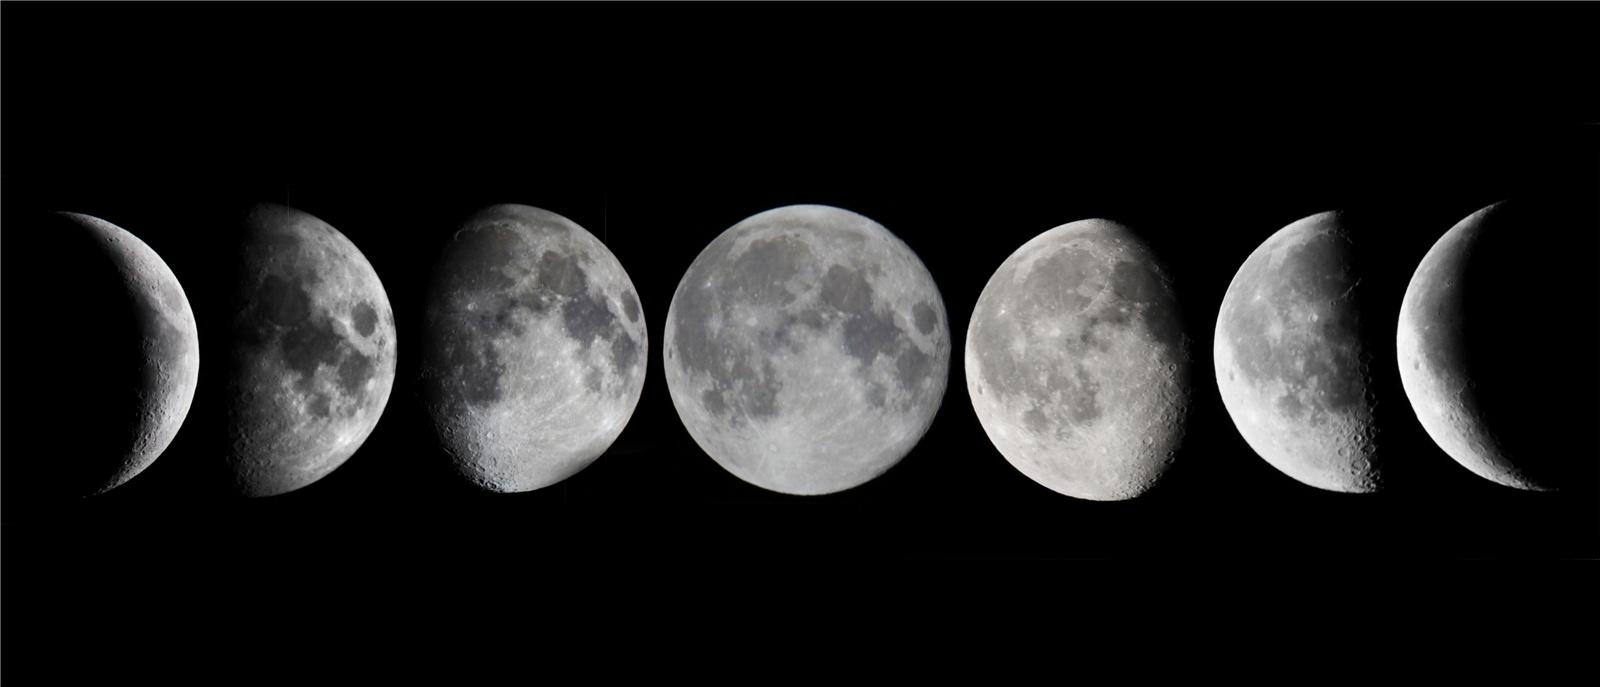 tumblr_static_tumblr_static_phases_of_the_moon__1_.jpg